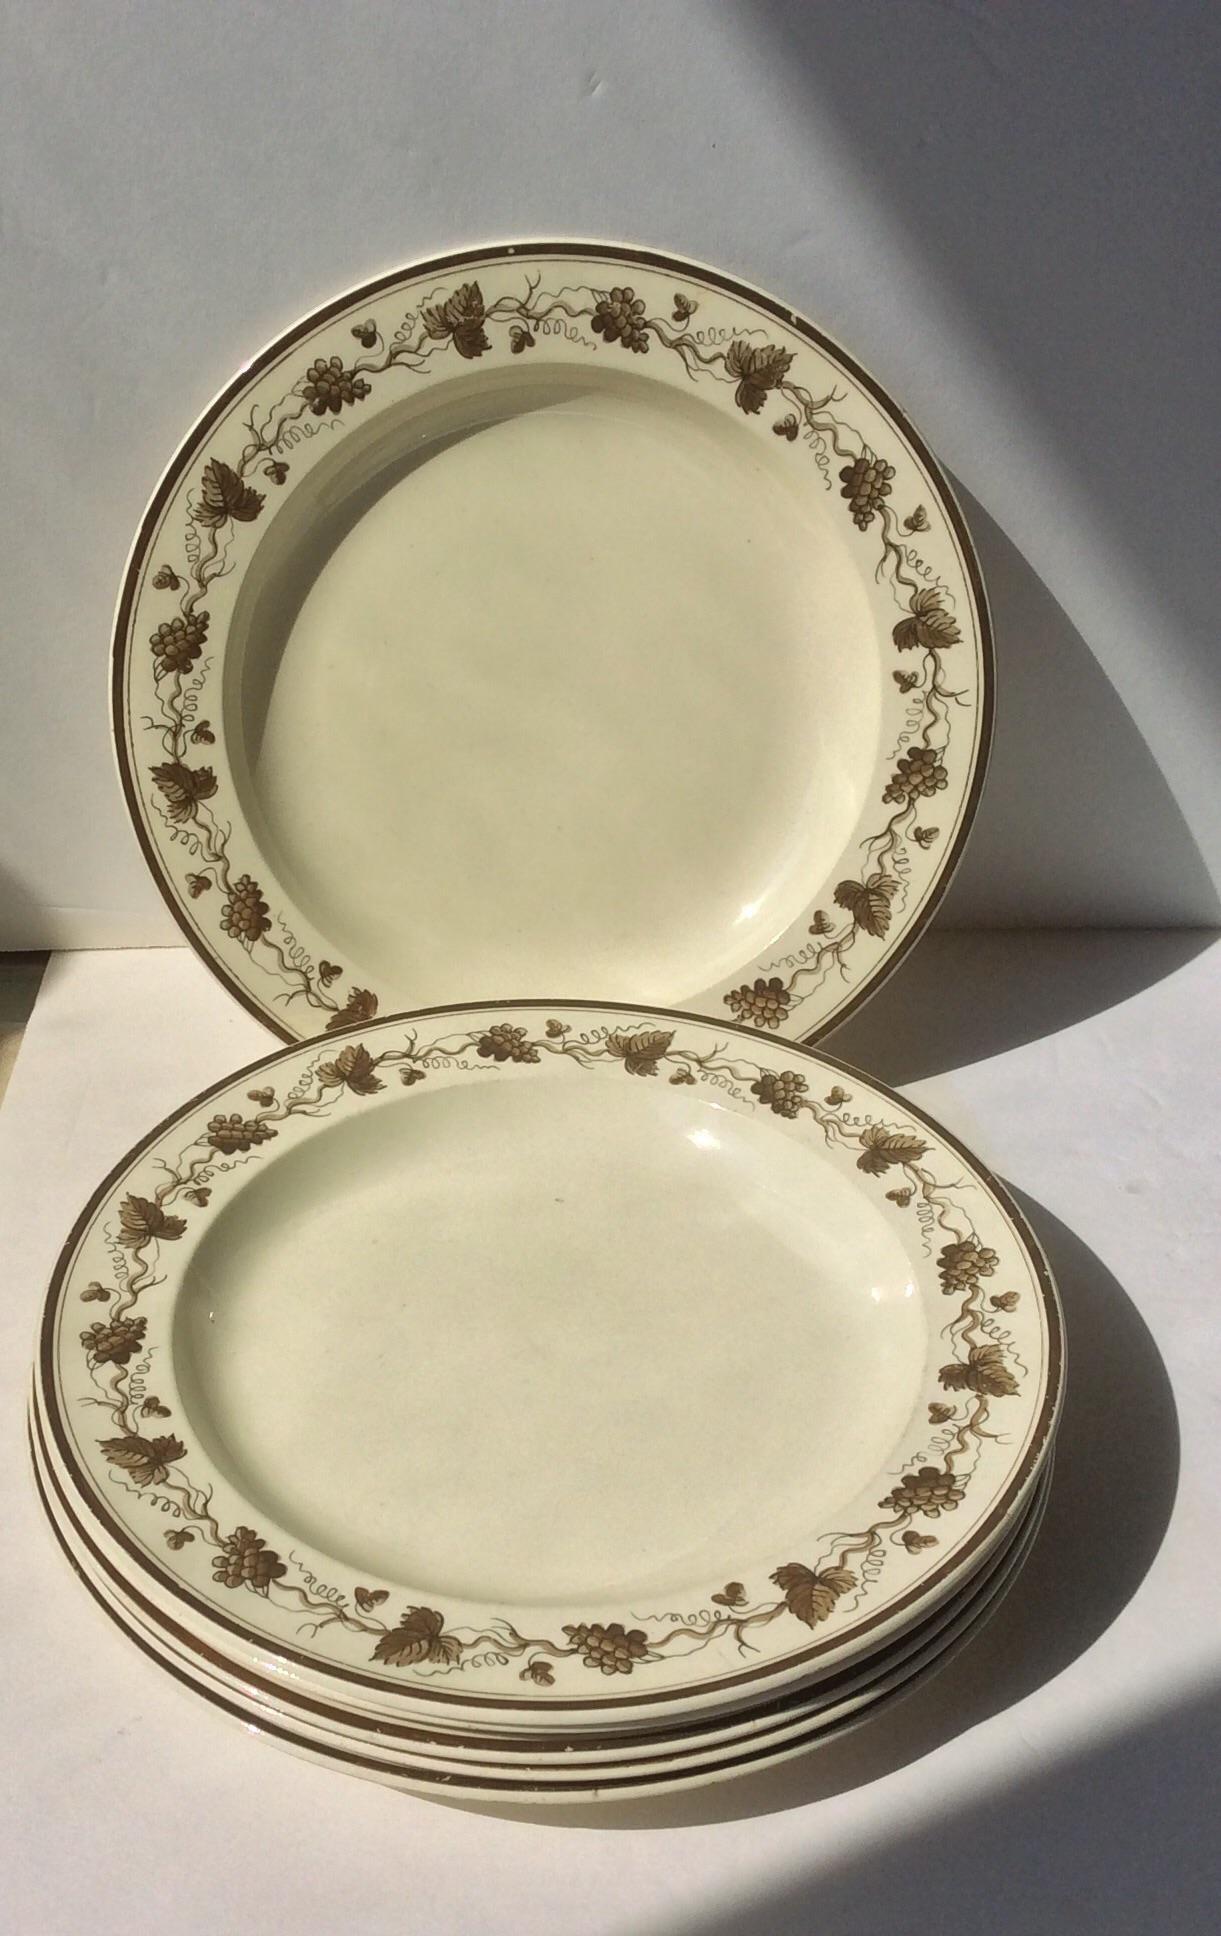 Creamware Plates With Grape Leaf Design - Set of 6 - Image 2 of 6  sc 1 st  Chairish & Creamware Plates With Grape Leaf Design - Set of 6 | Chairish